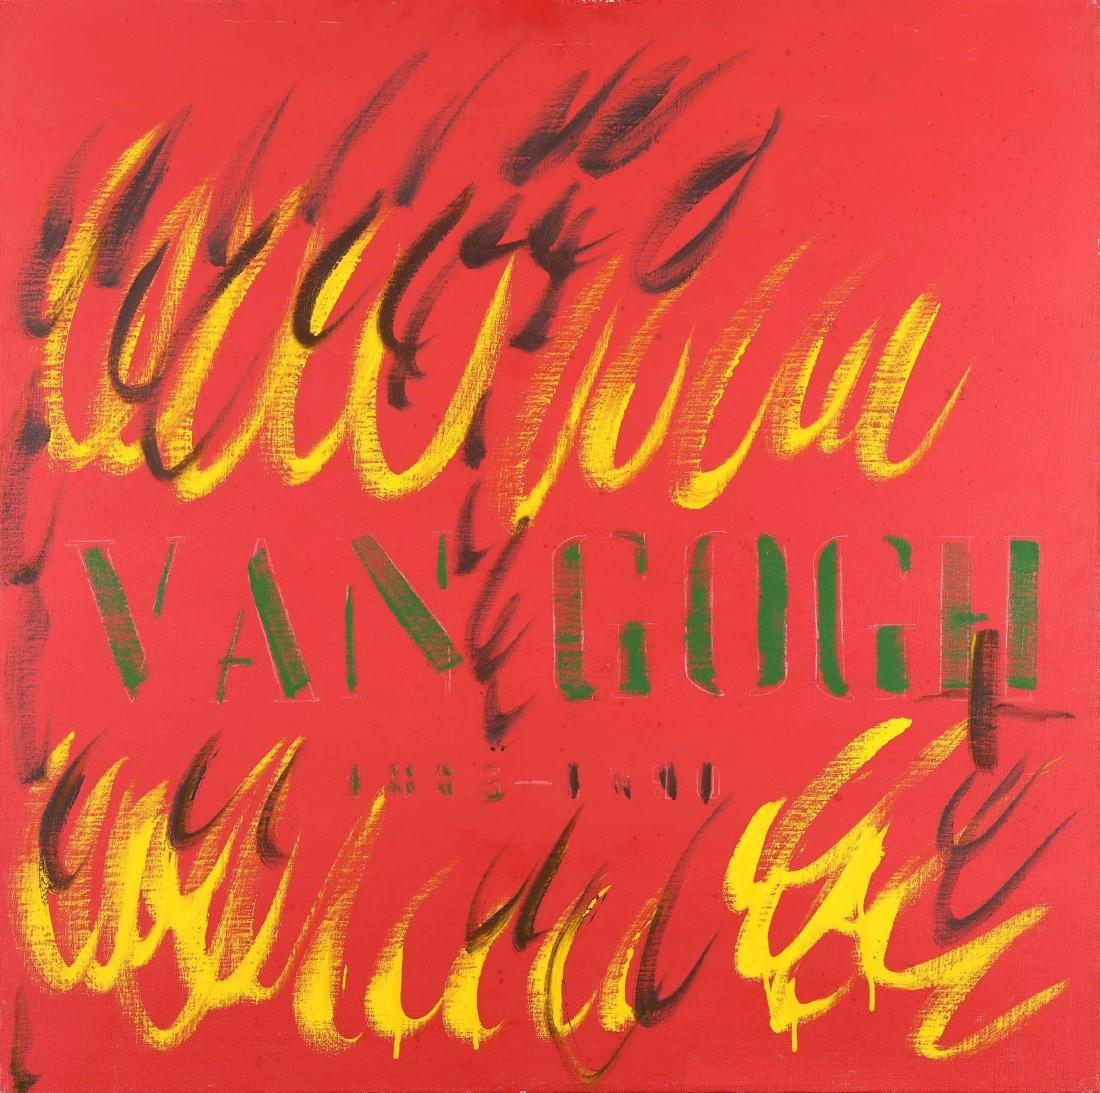 Tano Festa (1938-1988), Van Gogh, 1981